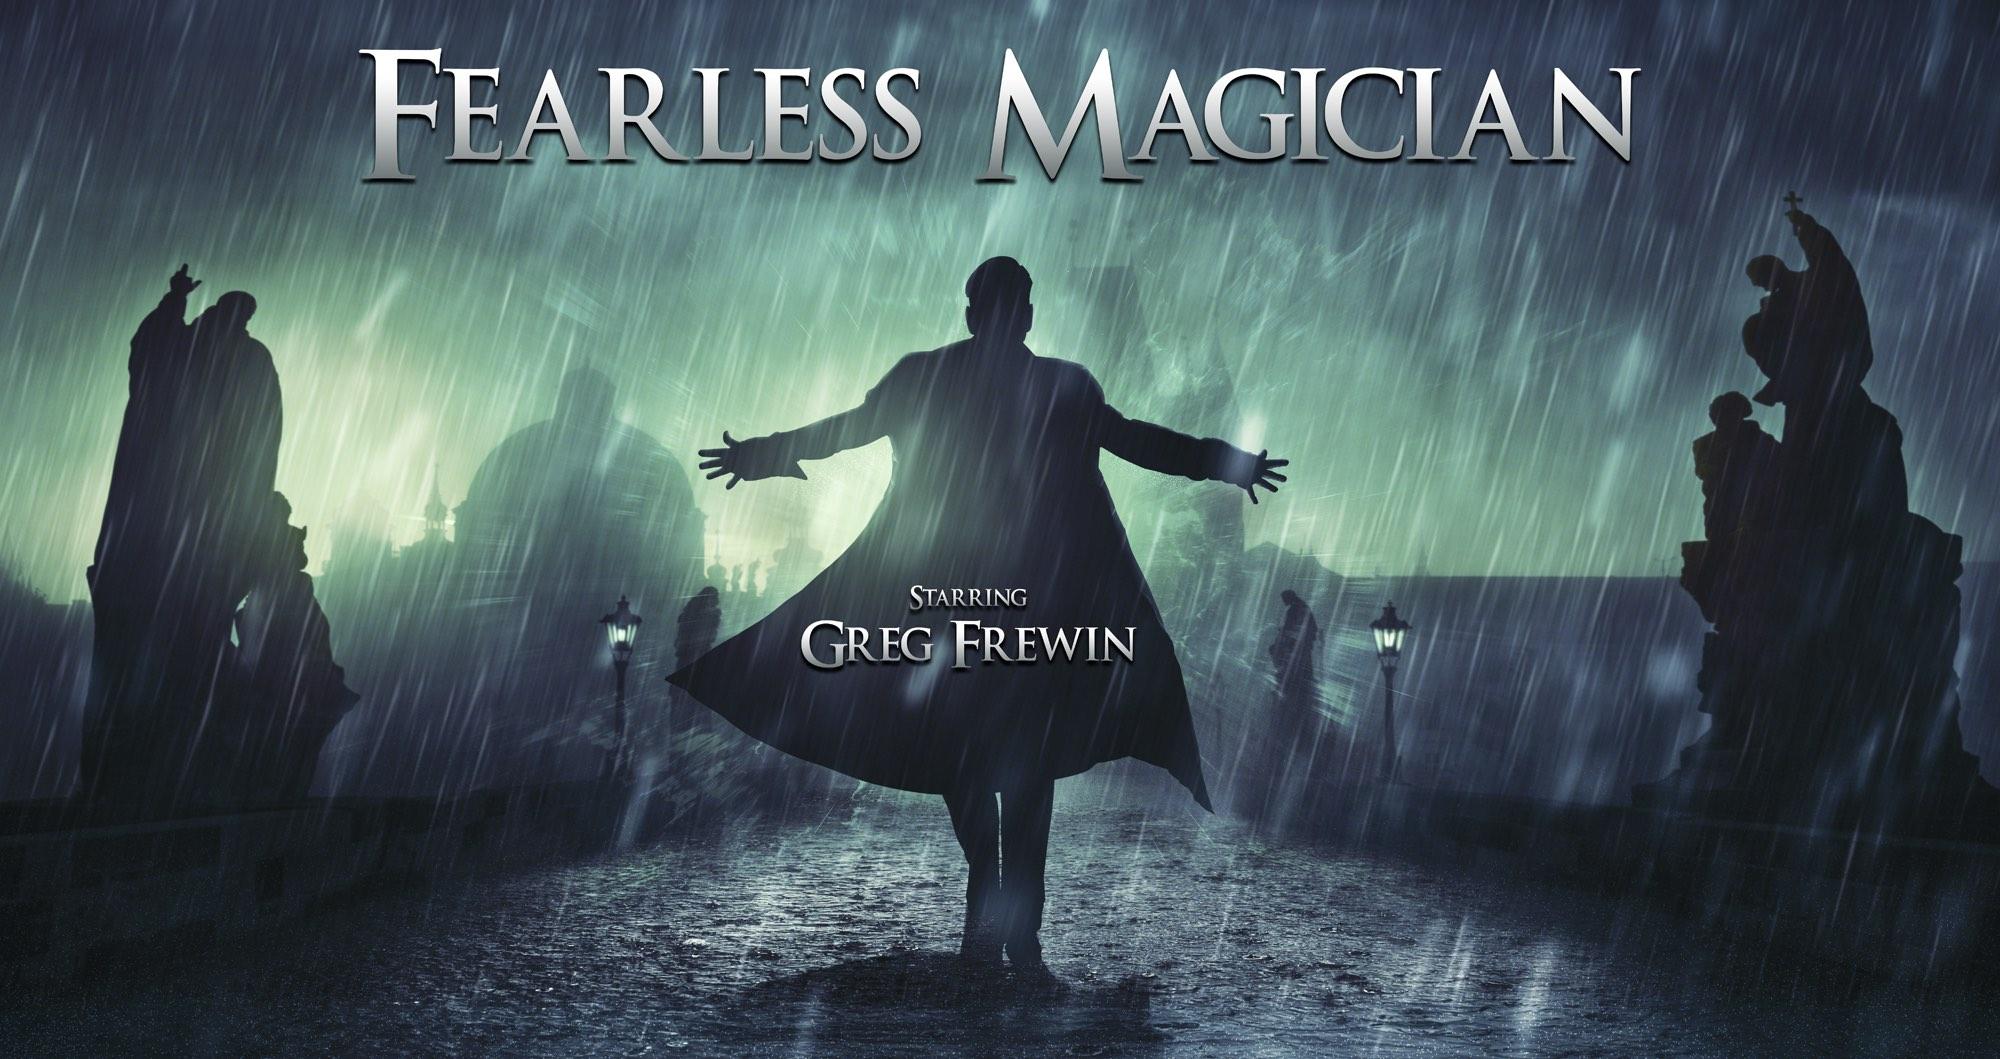 Greg Frewin - The Shadow (horizontal)